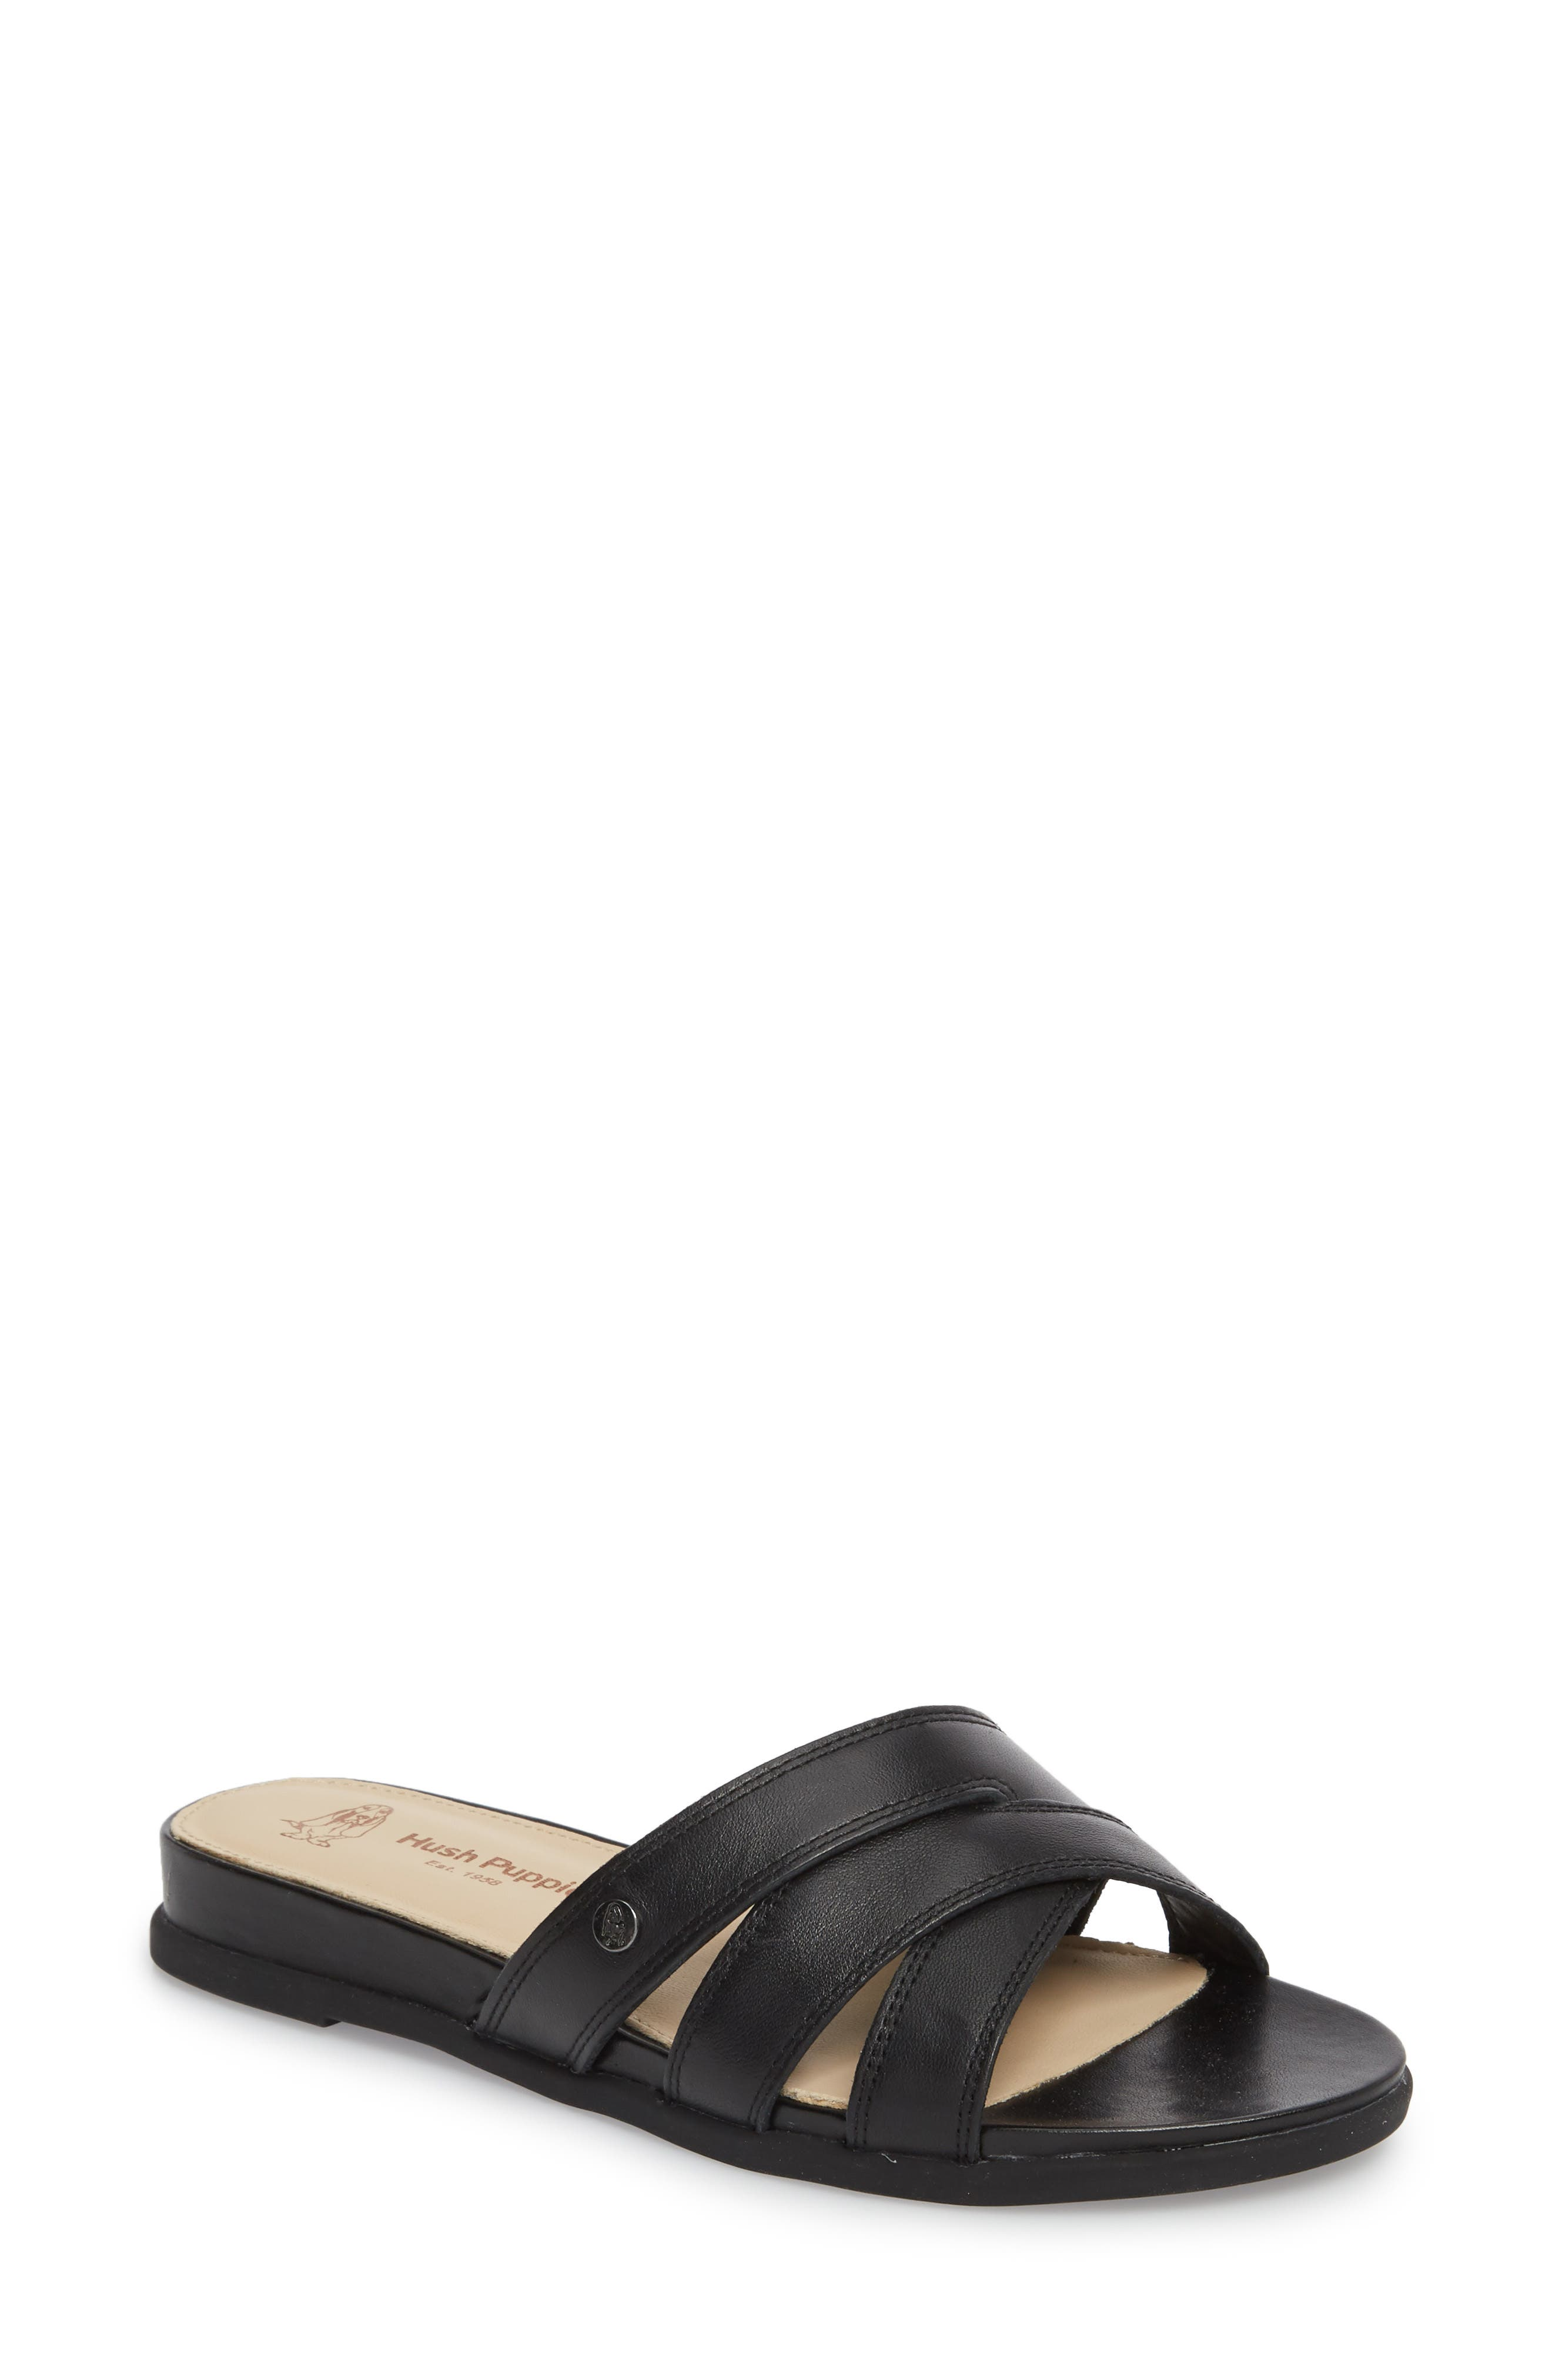 Dalmatian Slide Sandal,                             Main thumbnail 1, color,                             007